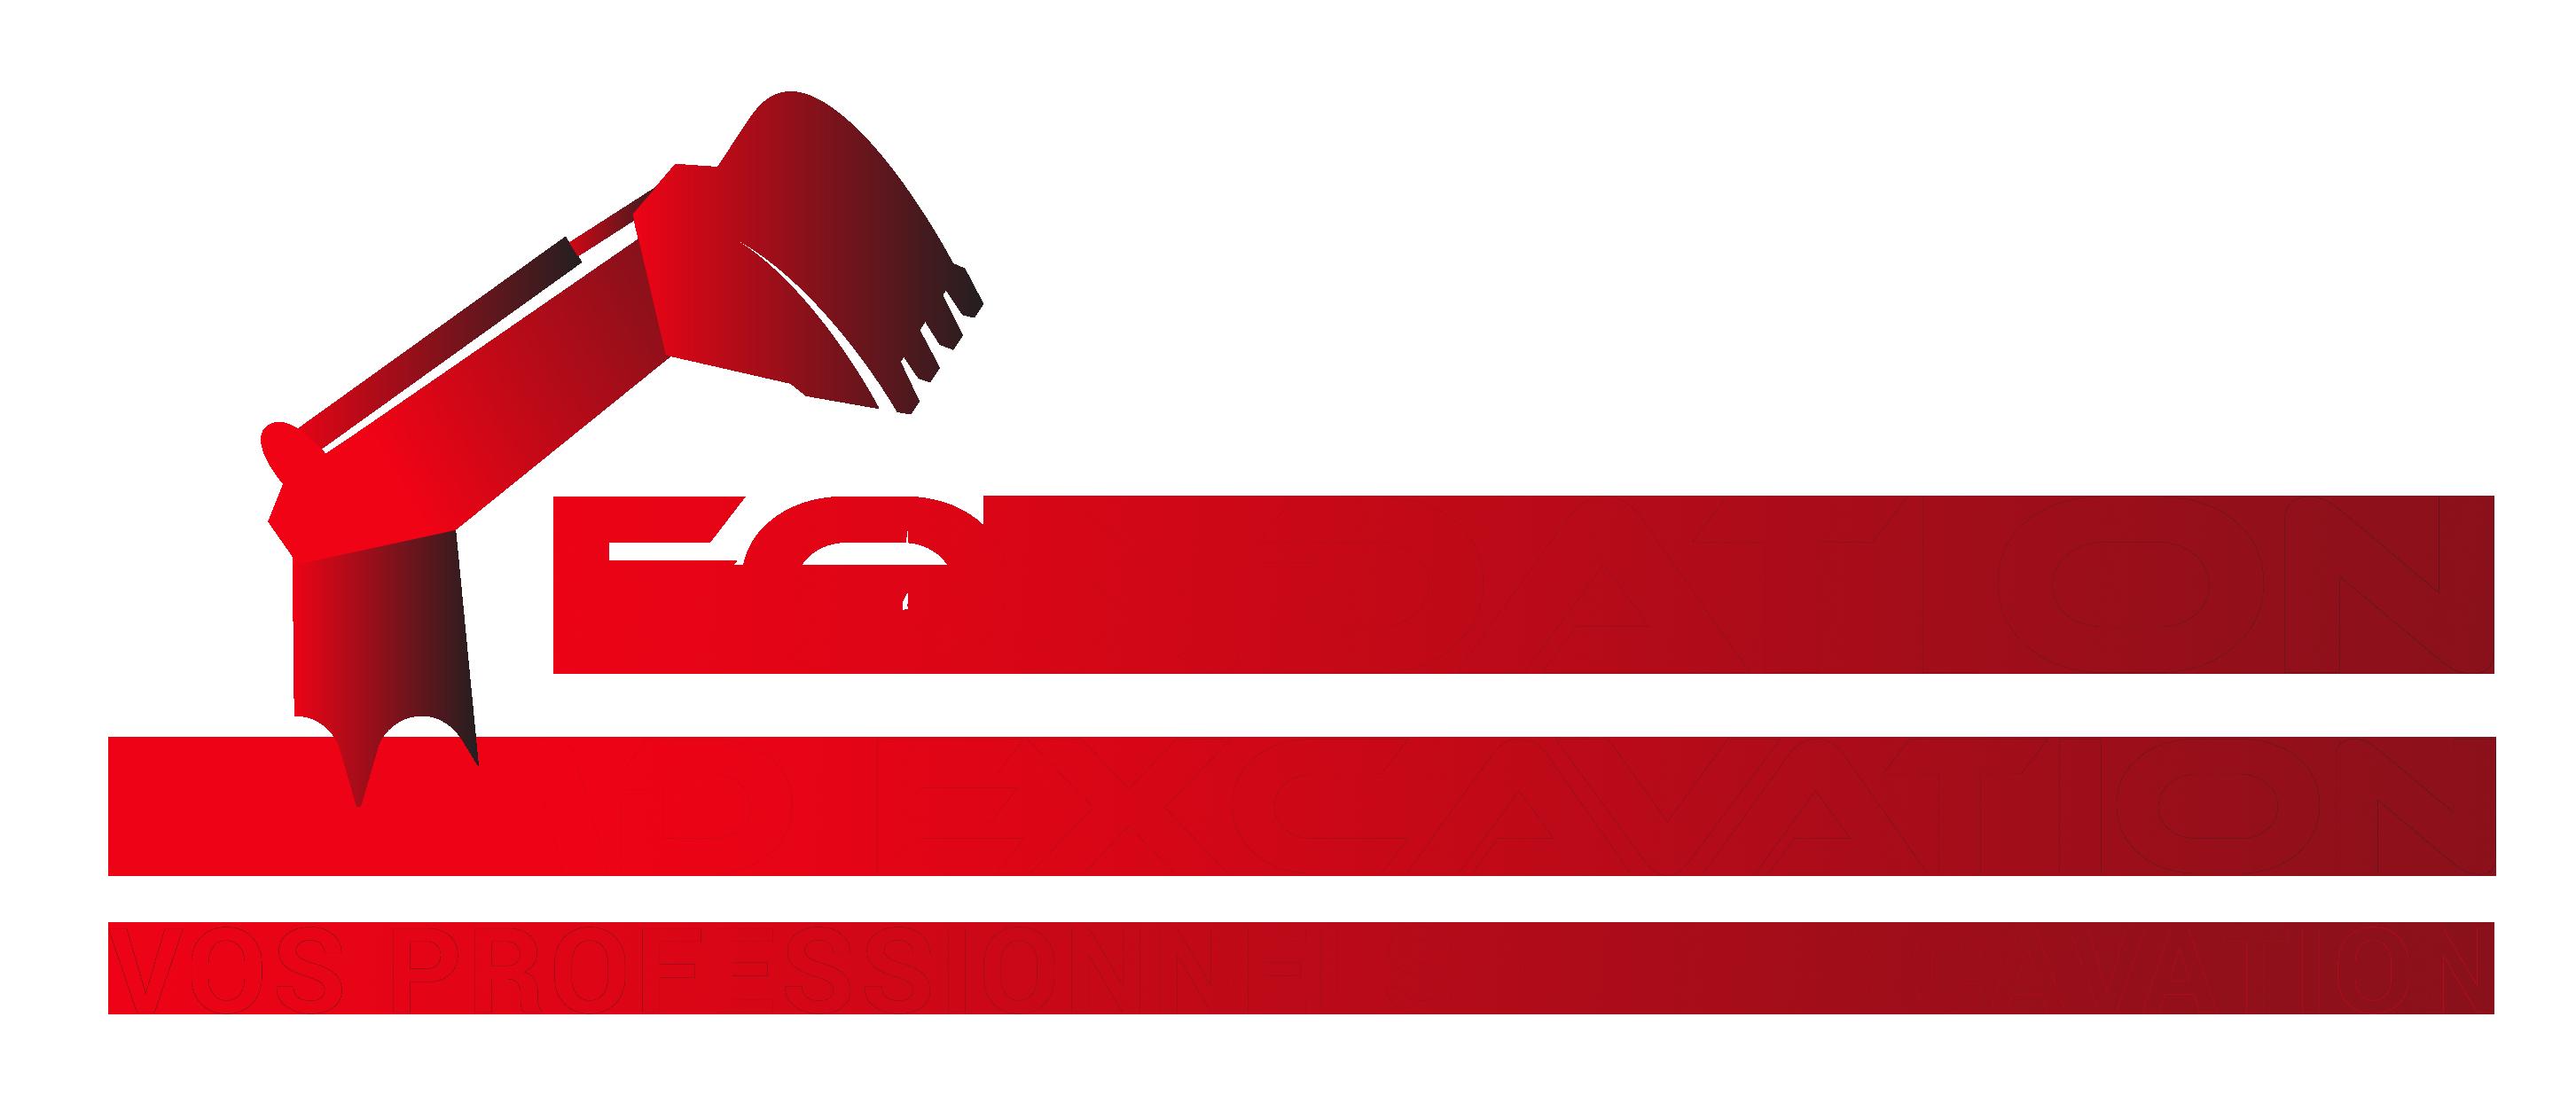 Fondation MMD logo